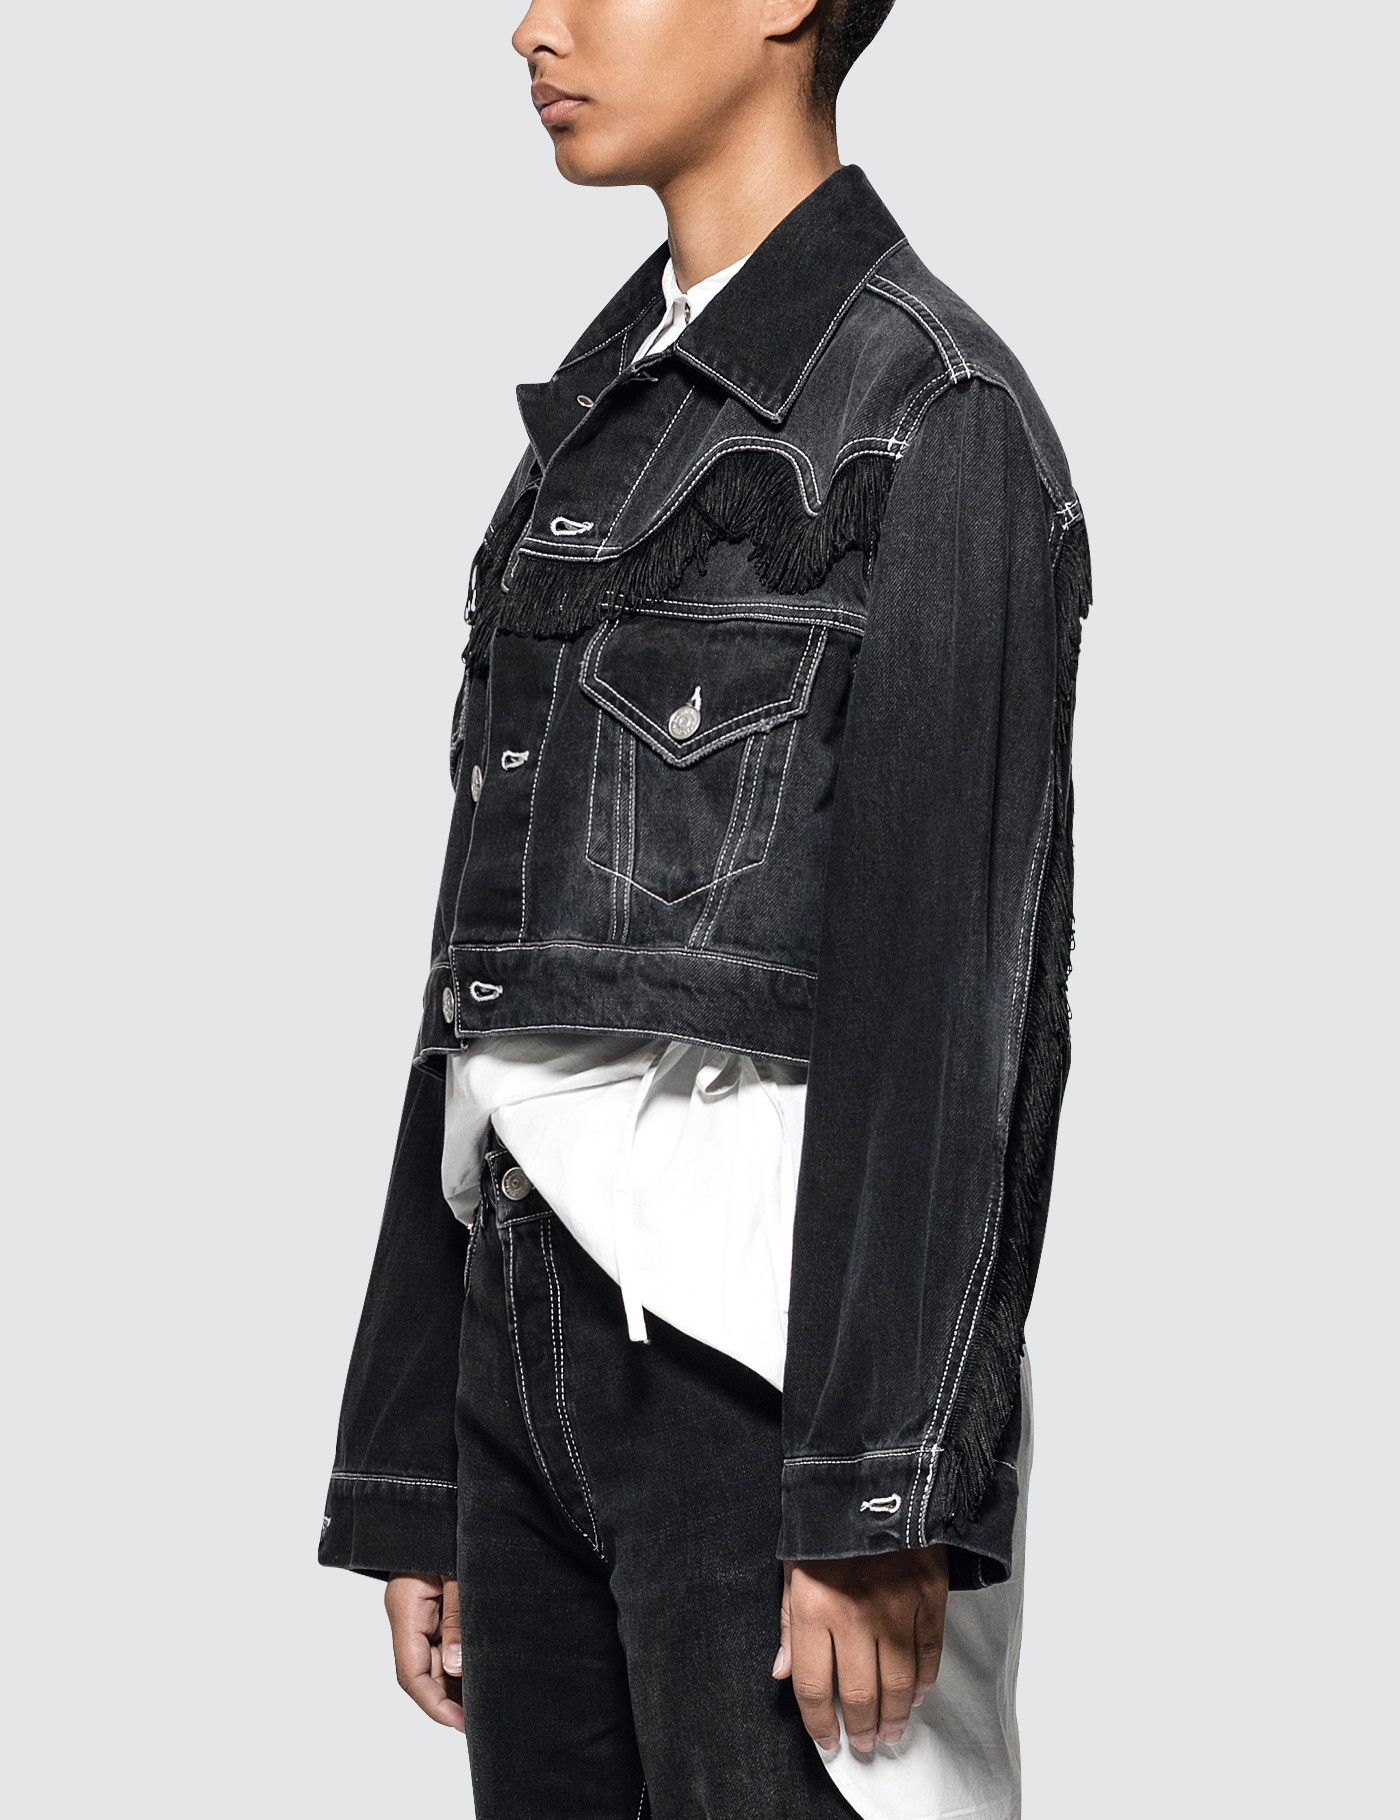 Ganni Rienzi Denim Jacket Hbx Denim Jacket Shopping Outfit Jackets [ 1820 x 1400 Pixel ]